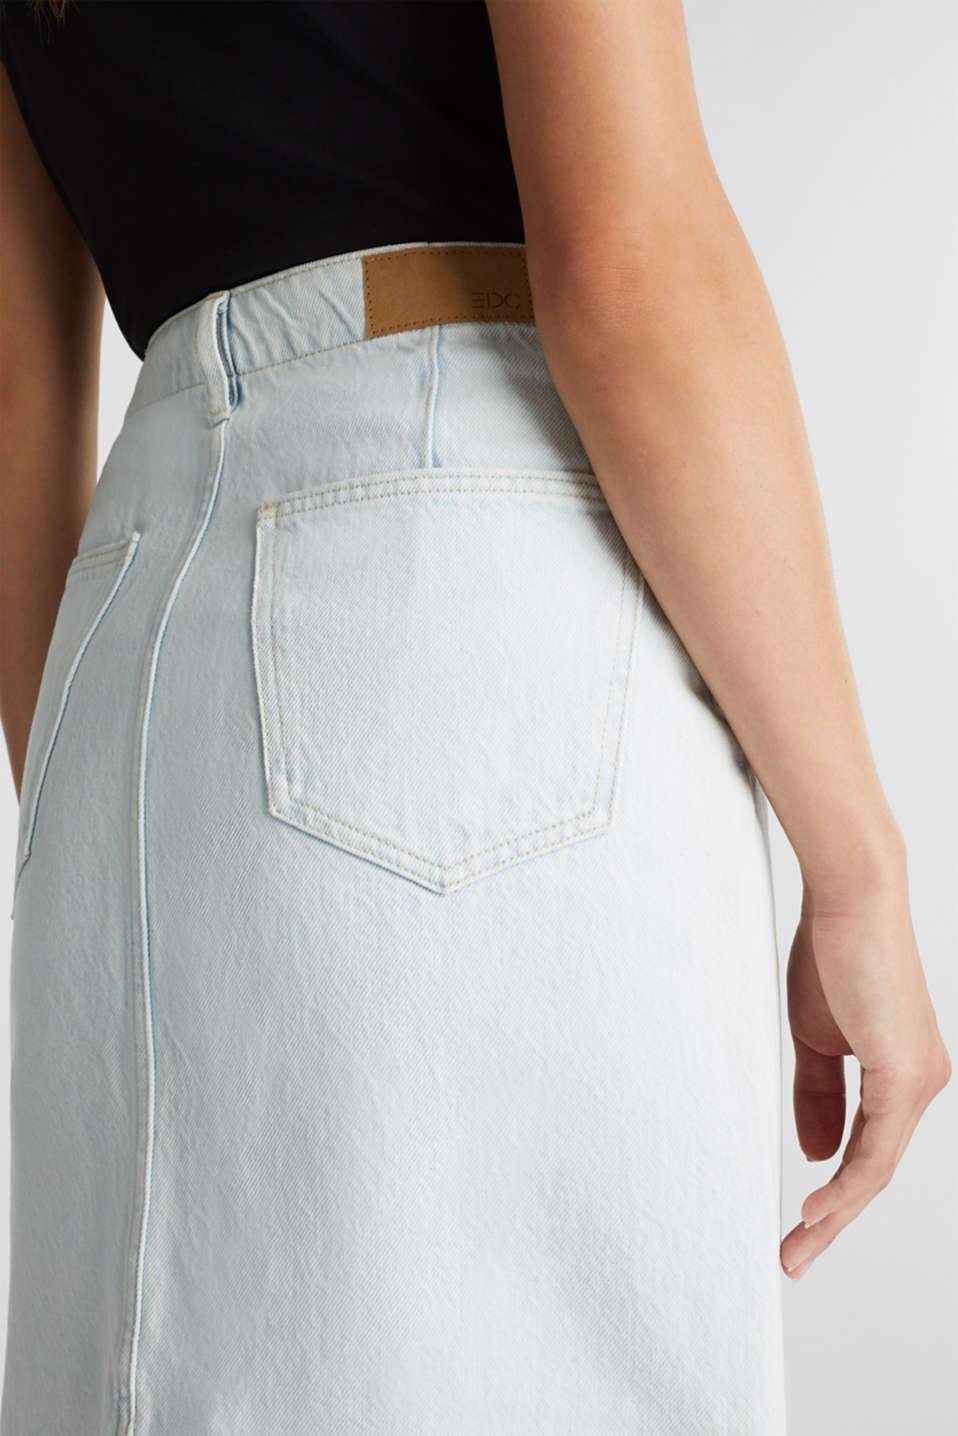 Denim skirt in 100% cotton, BLUE BLEACHED, detail image number 2